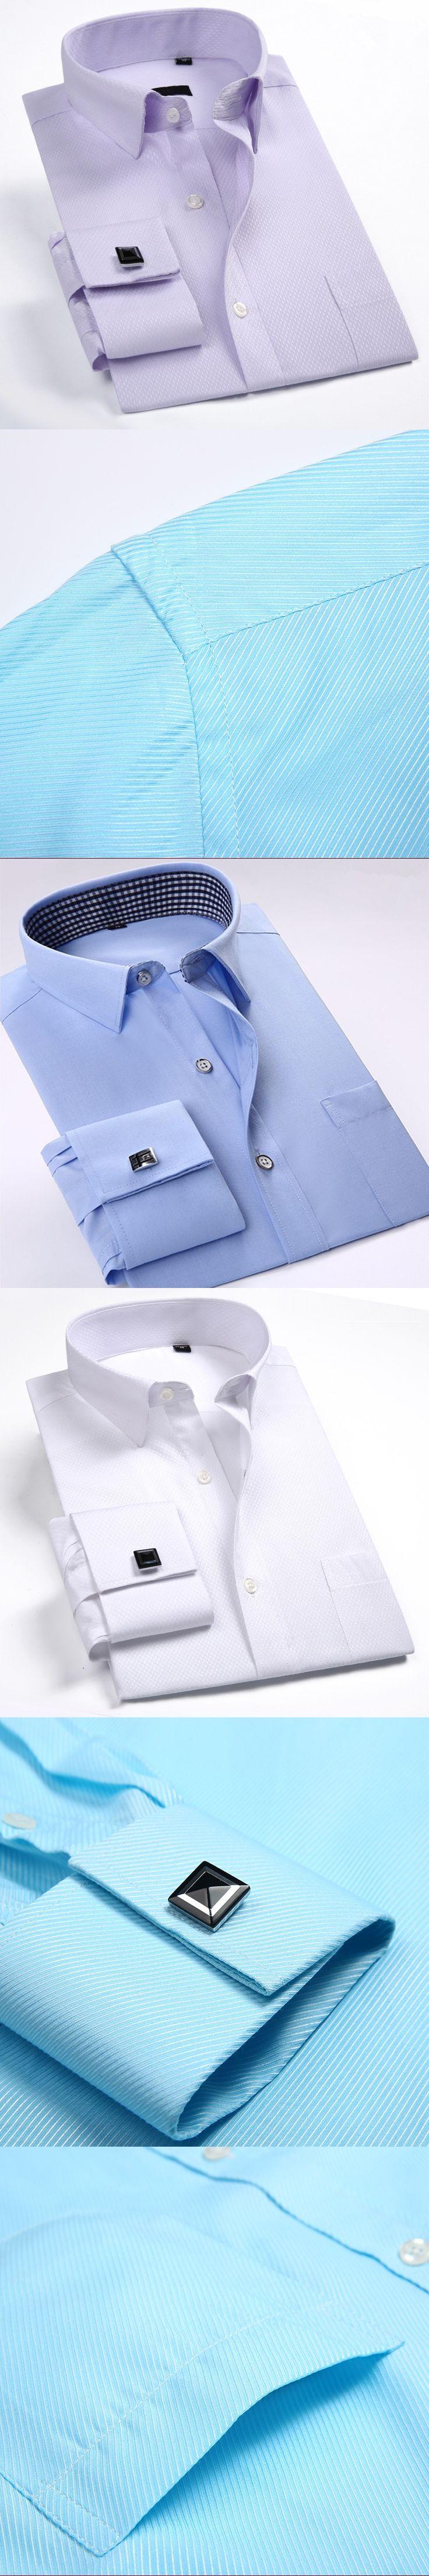 Men's French Shirt Cufflinks 2017 New Men's Shirt With Long Sleeve Casual Men's Brand Shirts Slim Fit French Cuffs Shirts Men